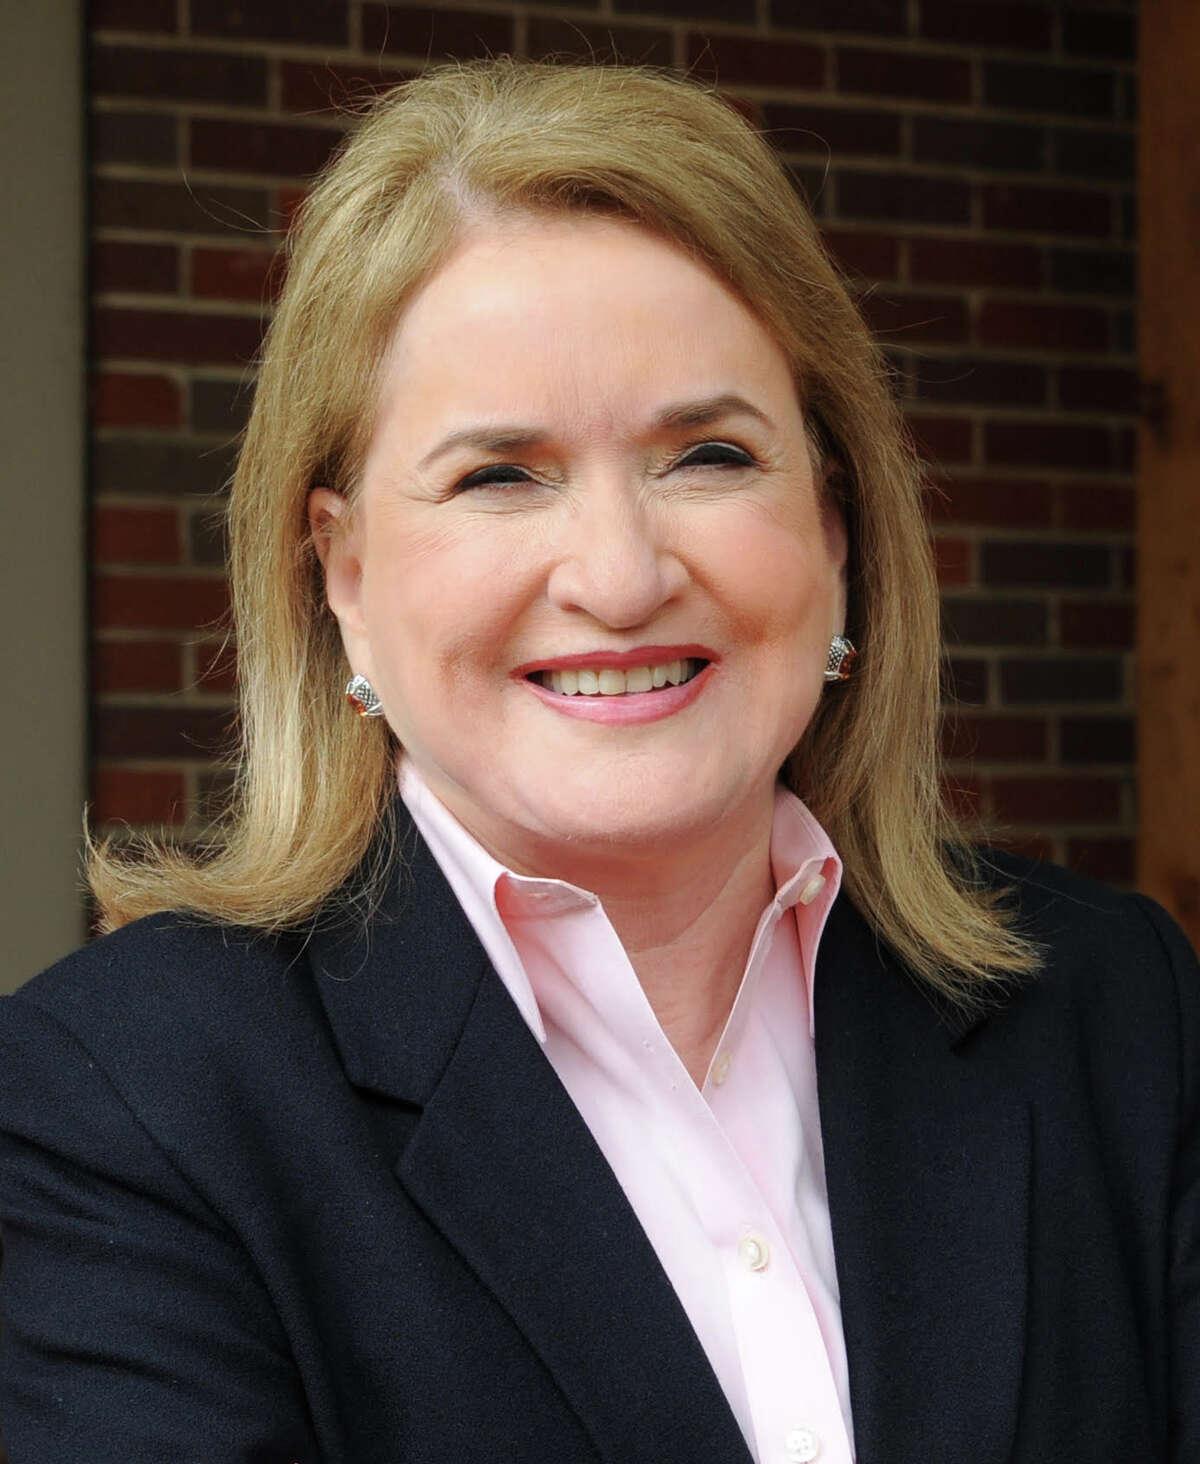 Sylvia R. Garcia, candidate for U. S. Representative District 29. (Photo courtesy Sylvia R. Garcia)